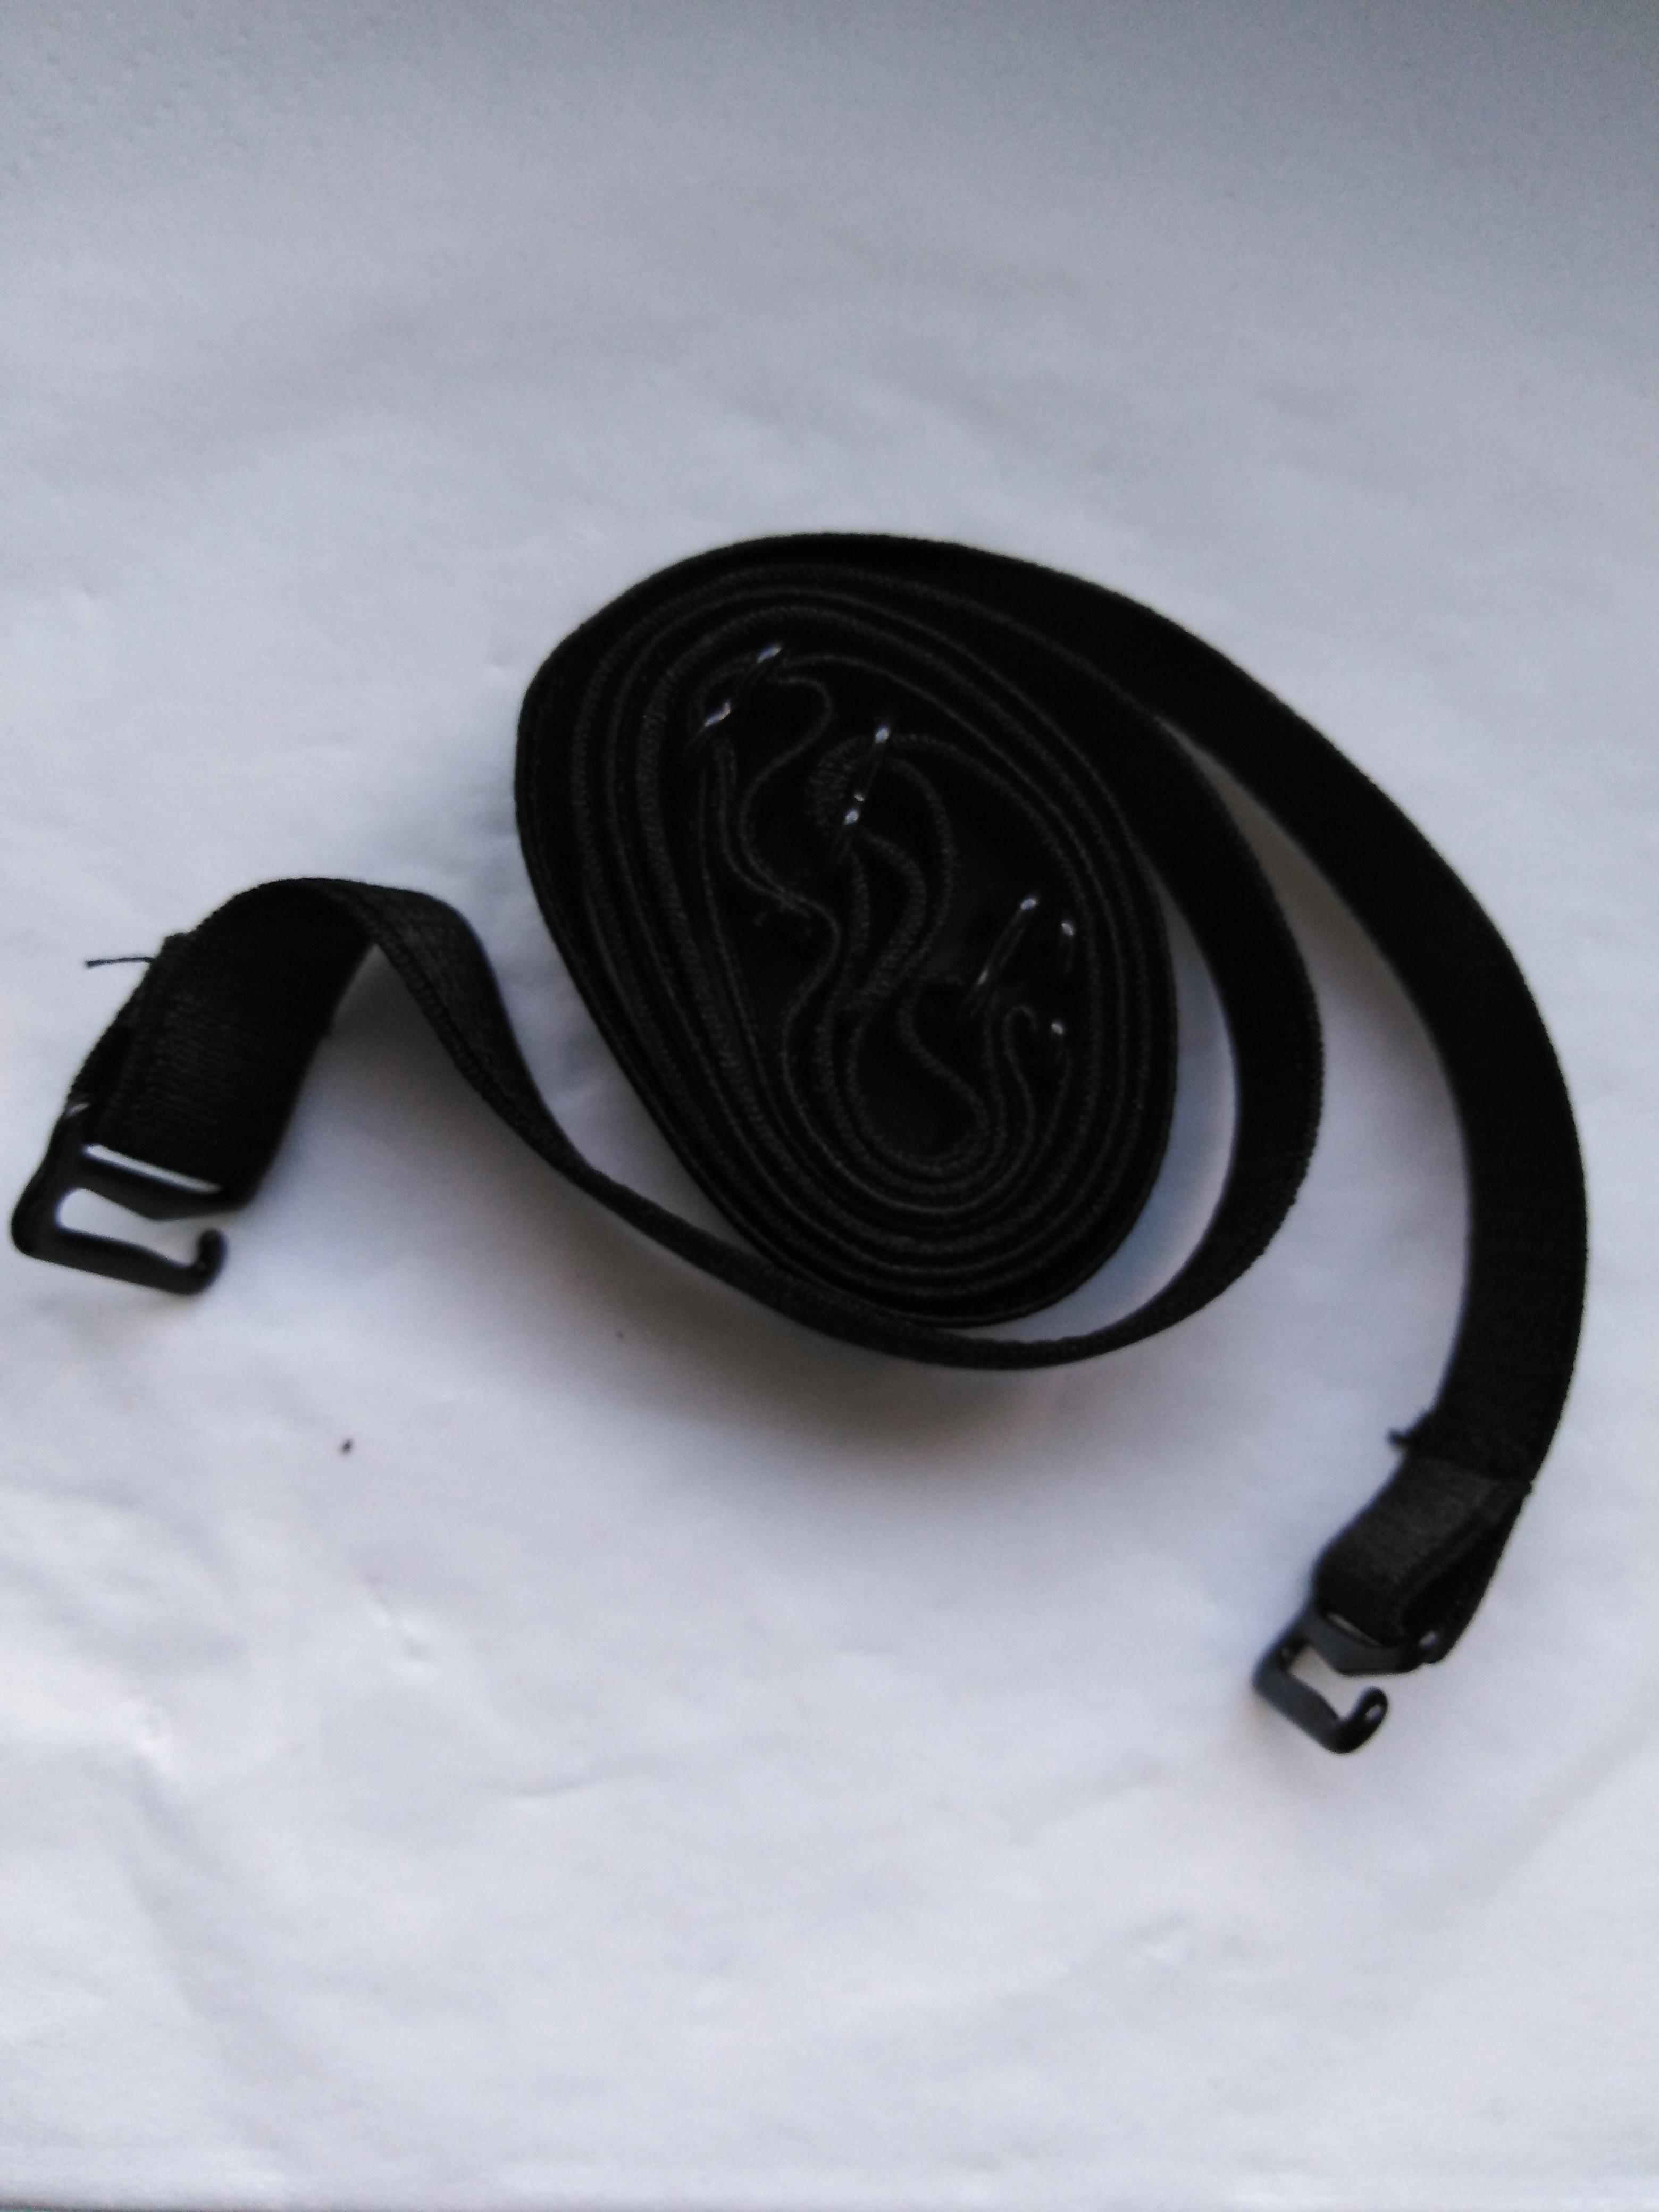 Ramínko pružné elastické 12 mm černé